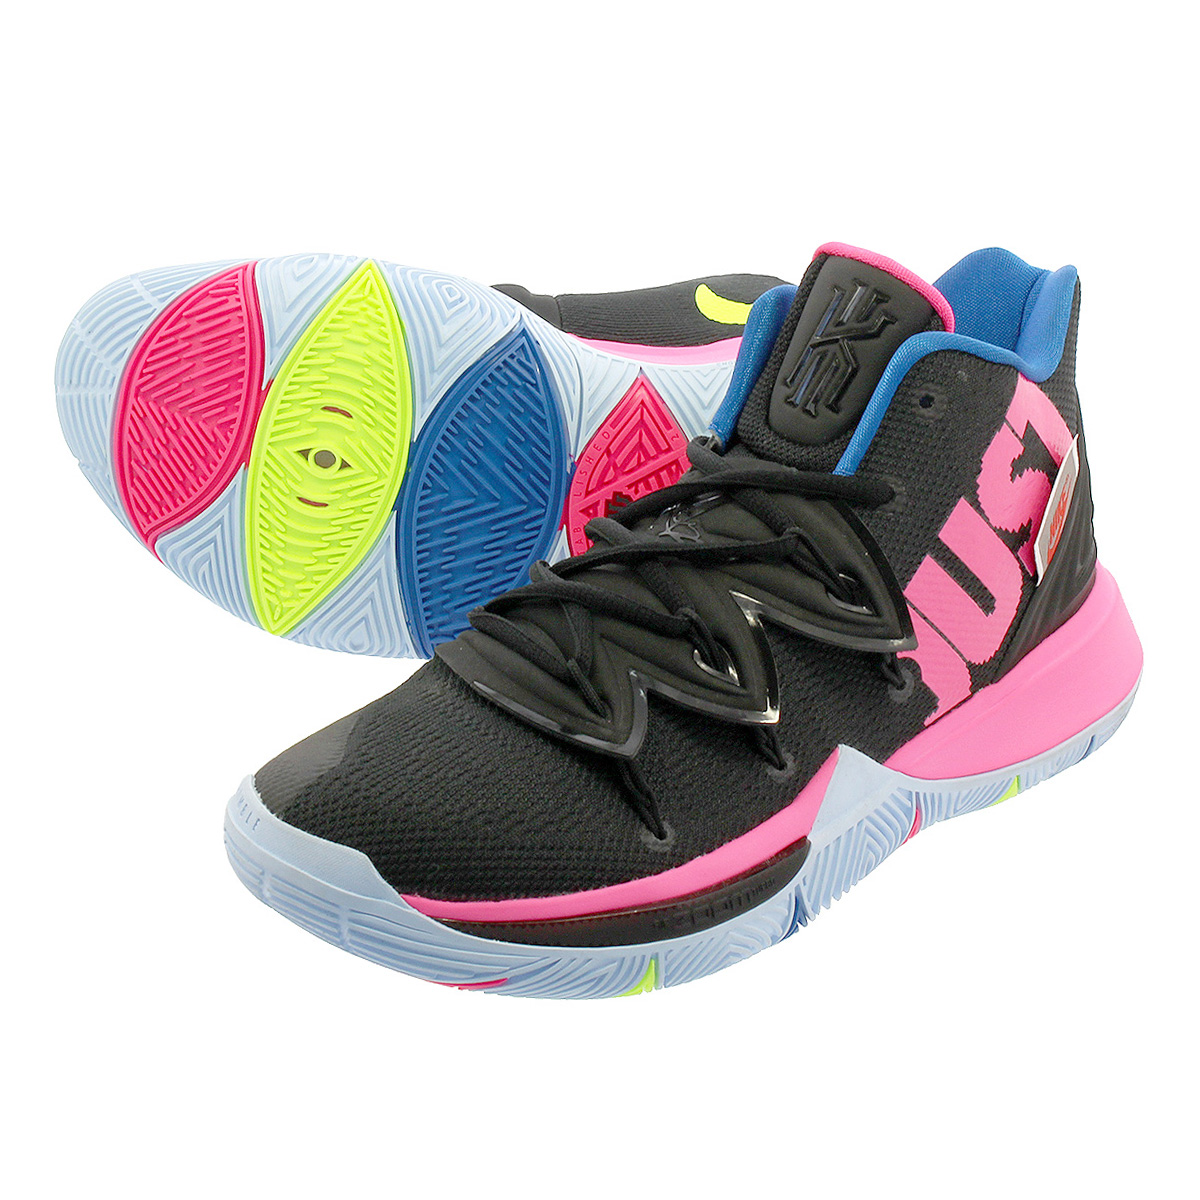 sale retailer 4ecca a630f LOWTEX PLUS: NIKE KYRIE 5 Nike chi Lee 5 BLACK/VOLT/HYPER PINK ao2918-003    Rakuten Global Market